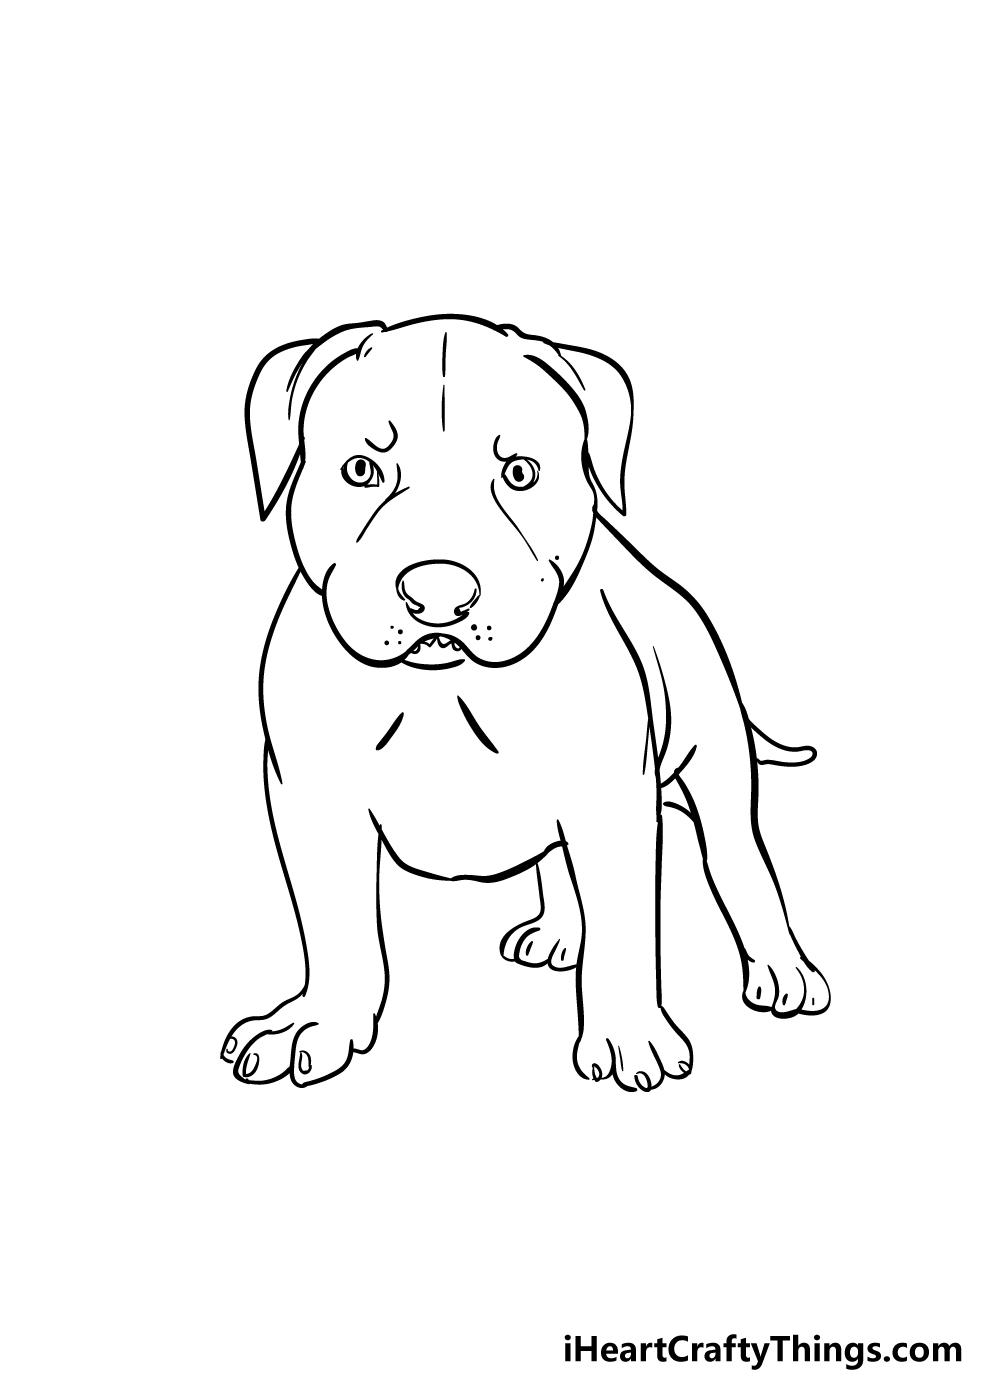 pitbull drawing step 7